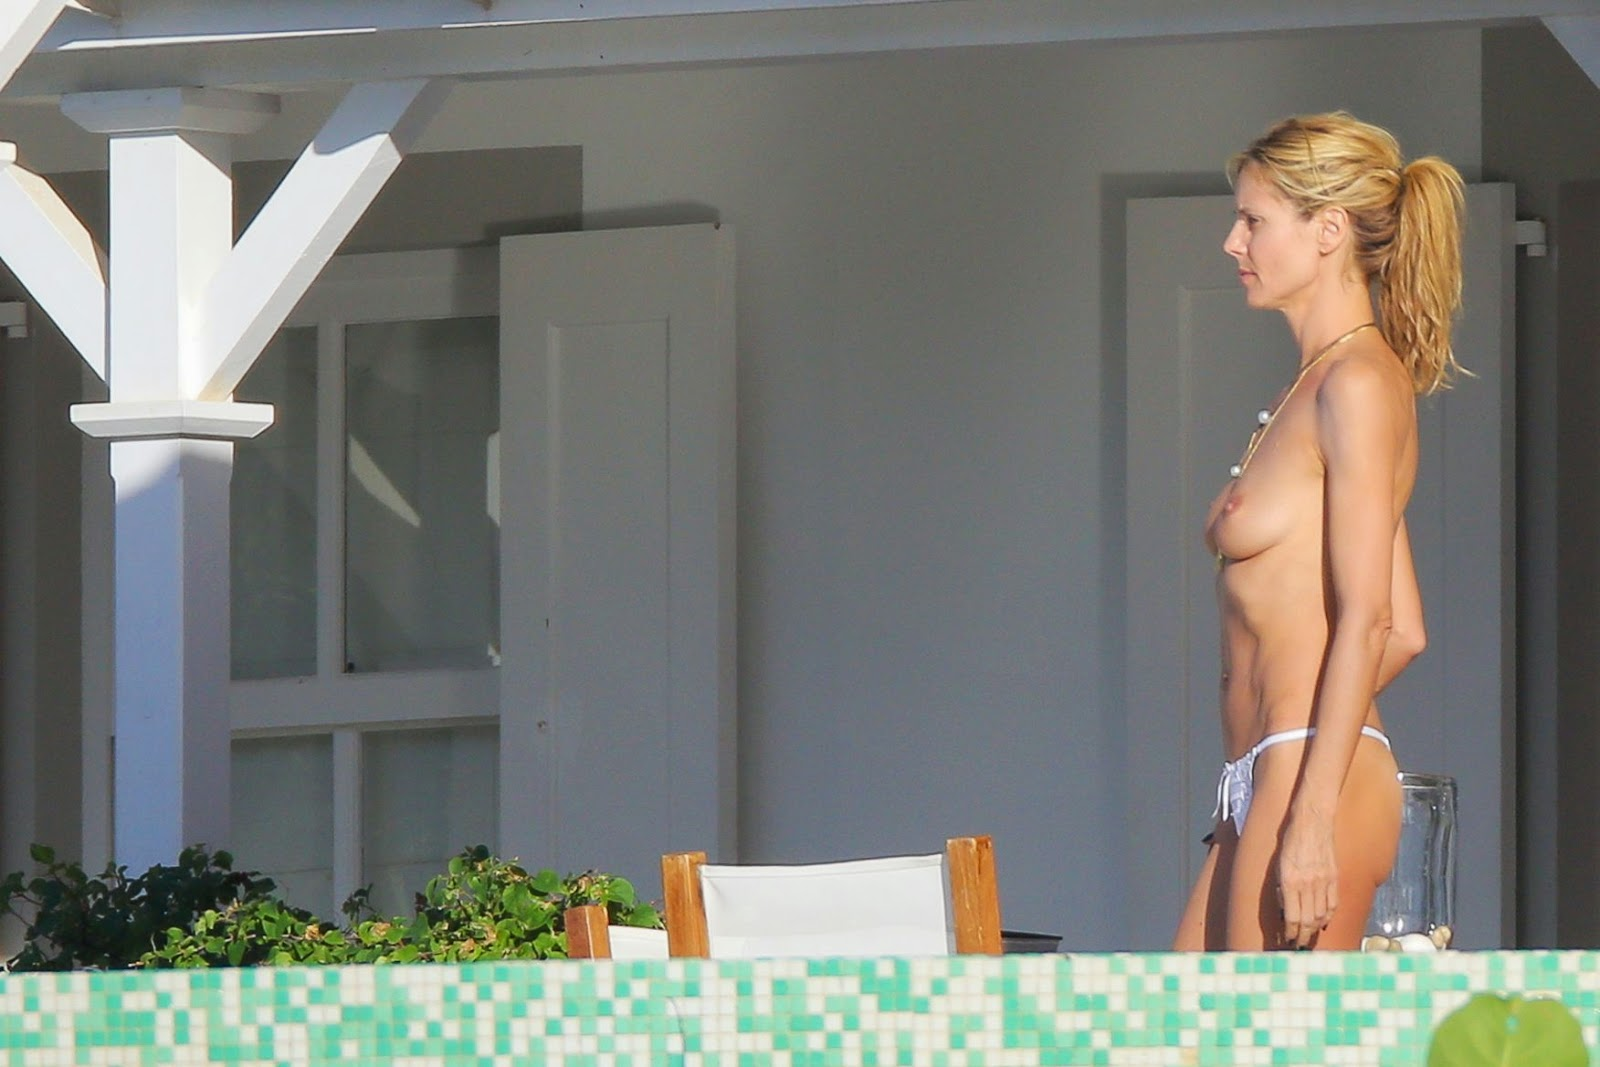 Lovely anal! nude heidi klum pussy Nice